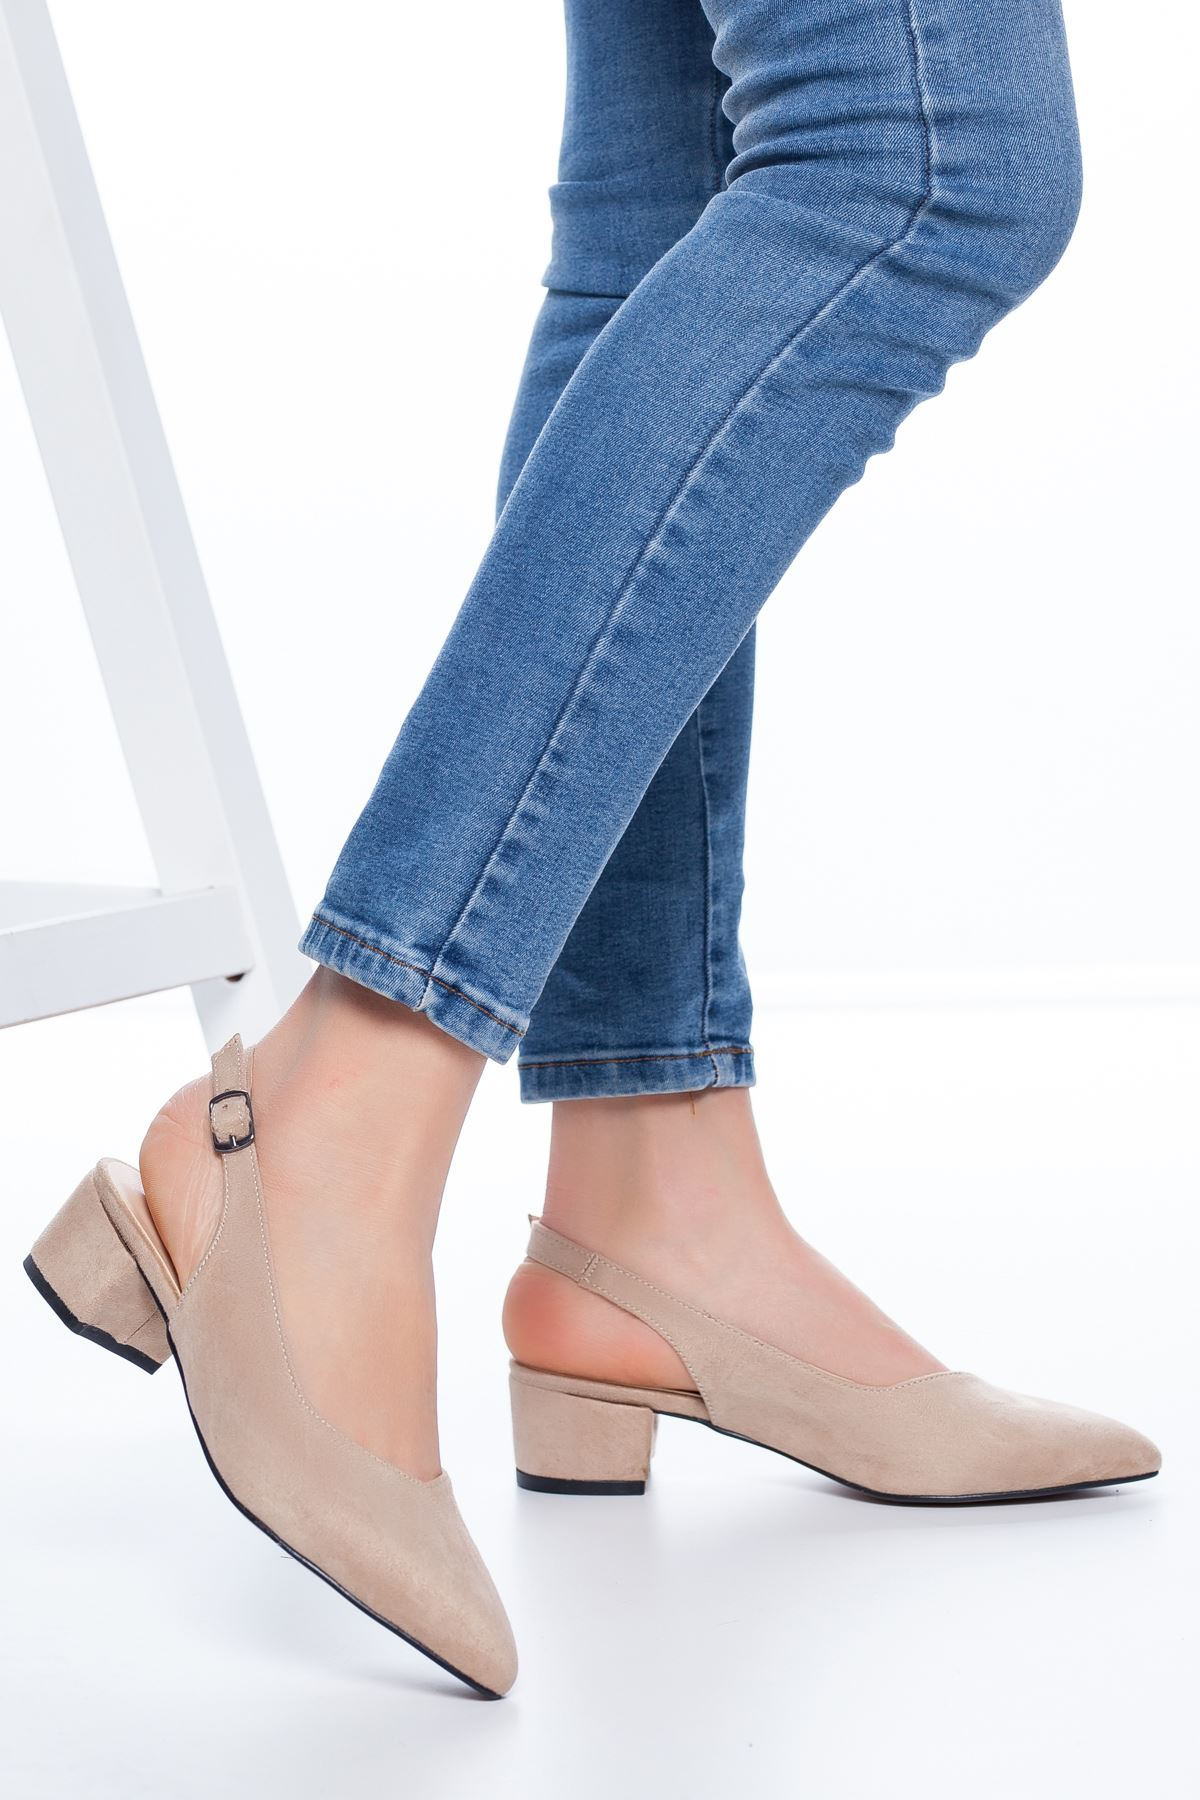 Adesa Topuklu Süet Ayakkabı Ten